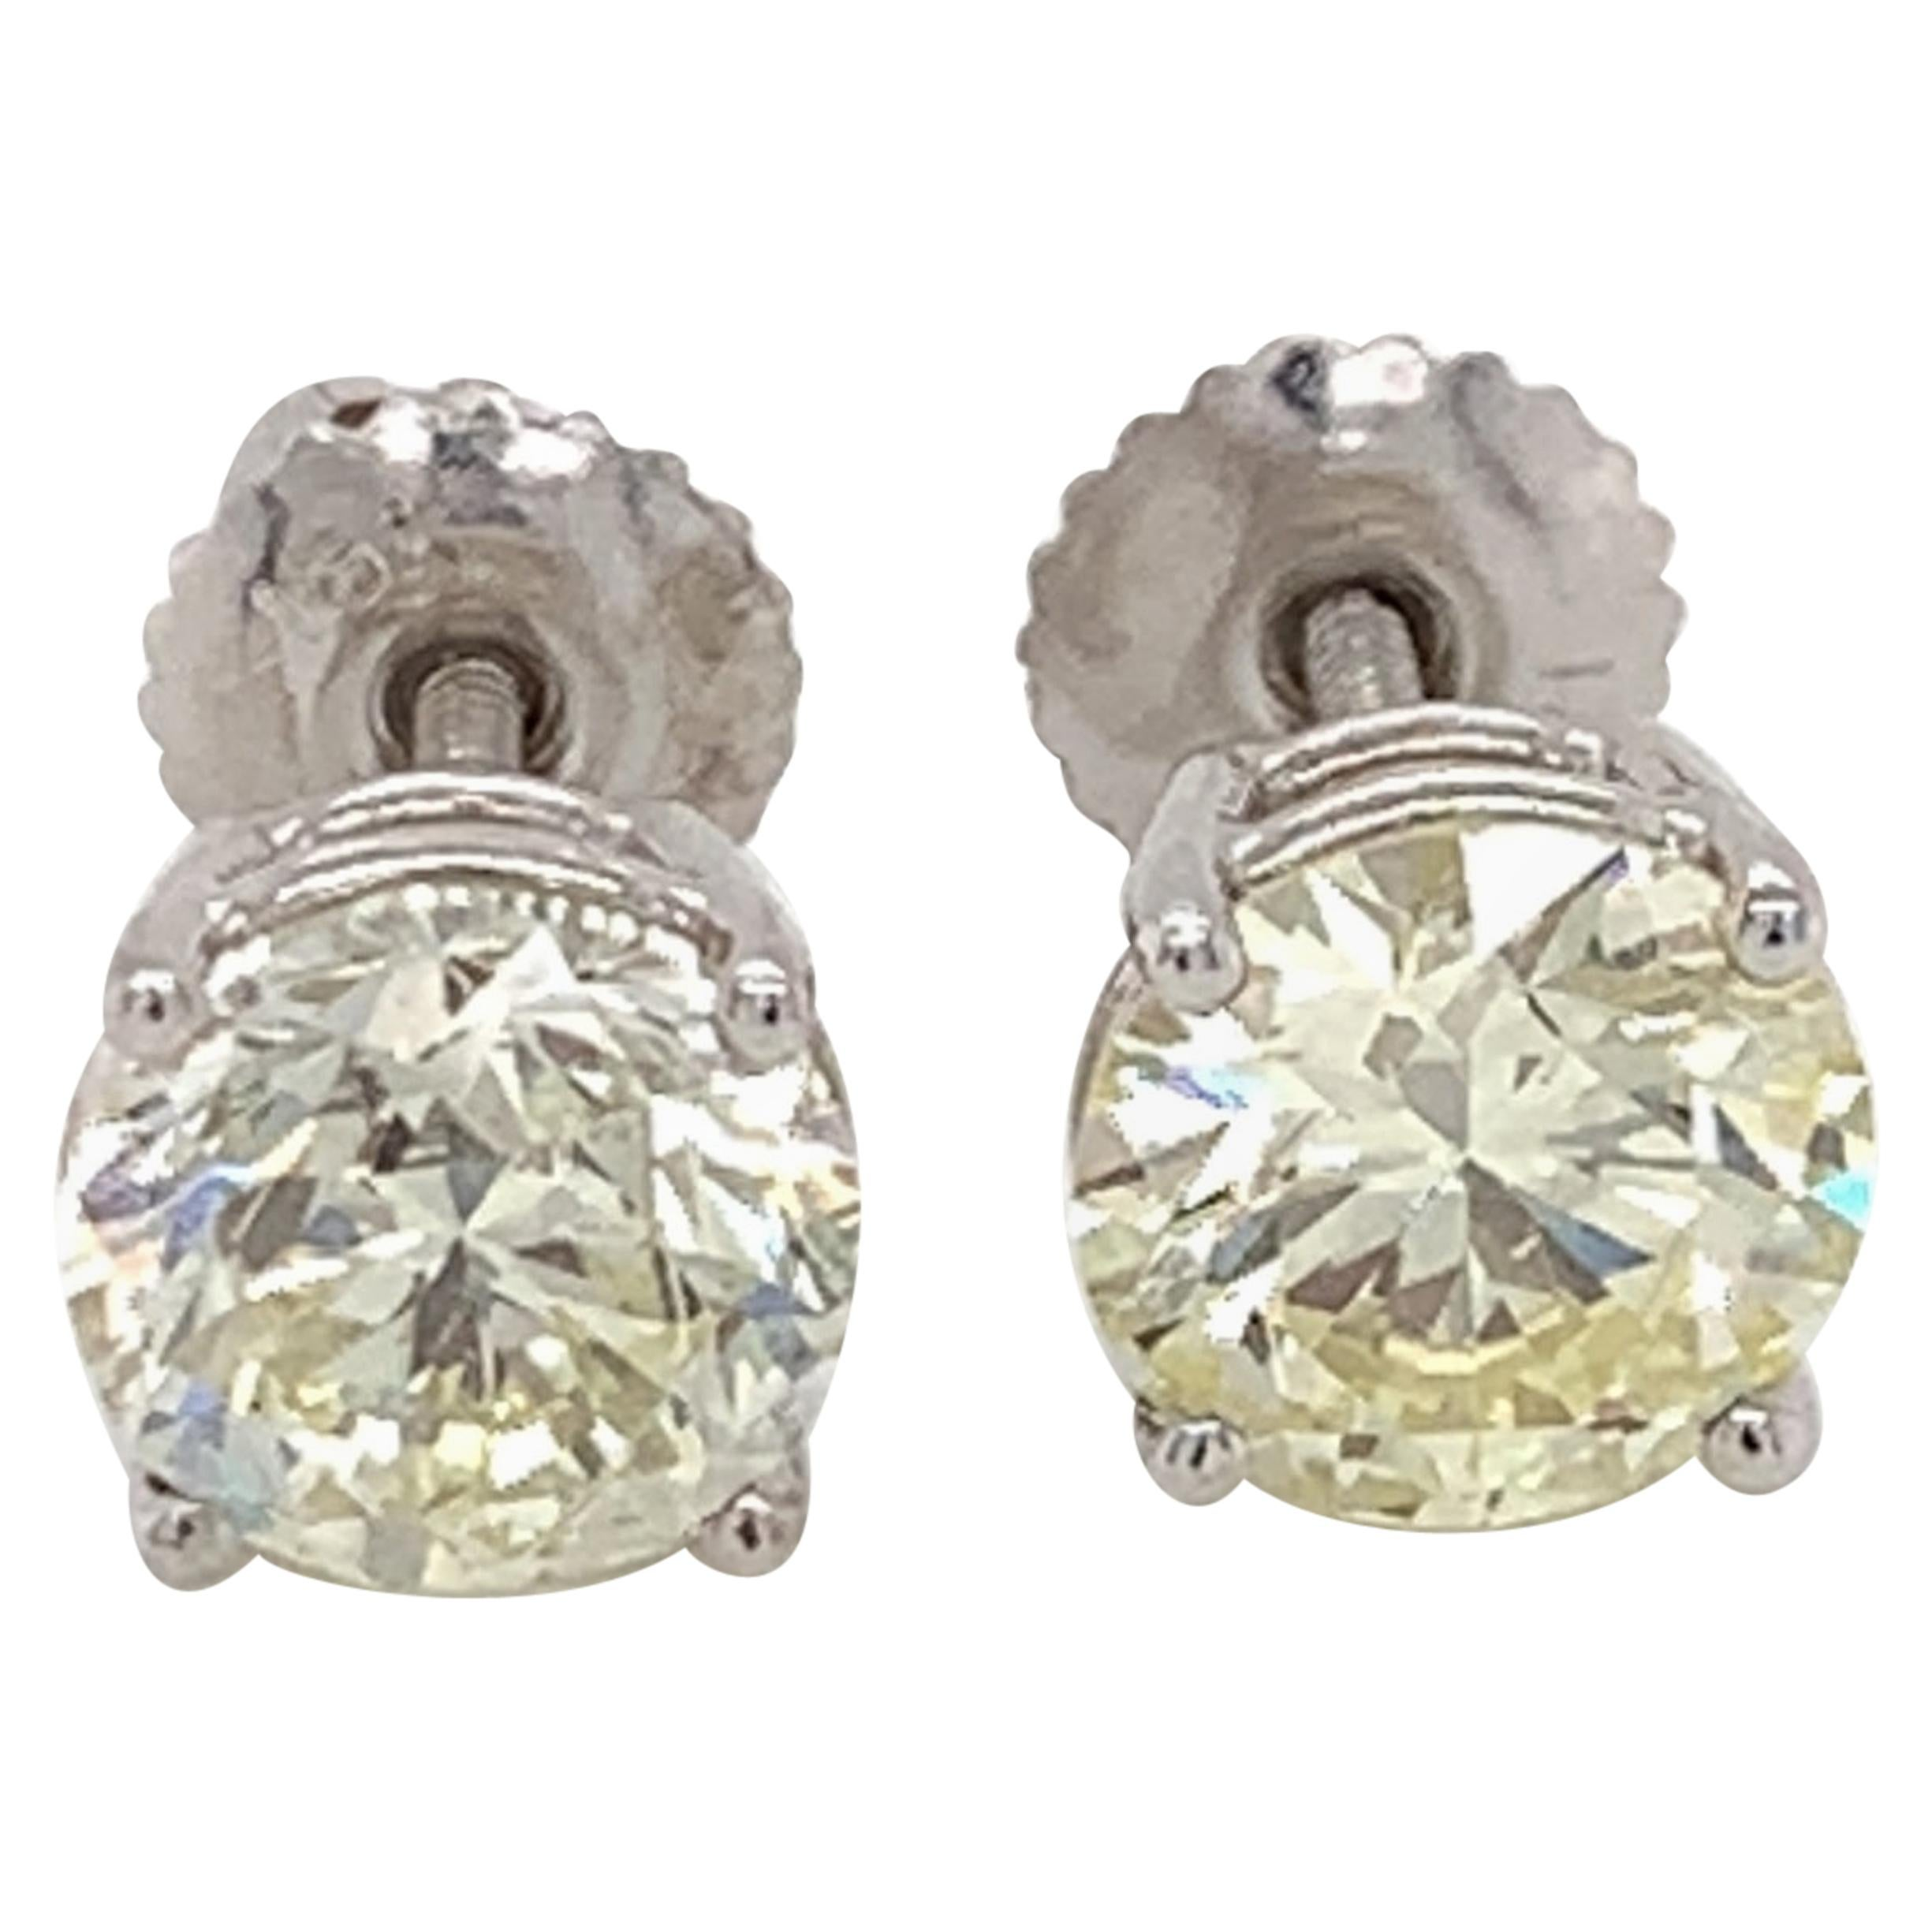 GIA Certified 2.61 Carat Diamond Stud Earrings